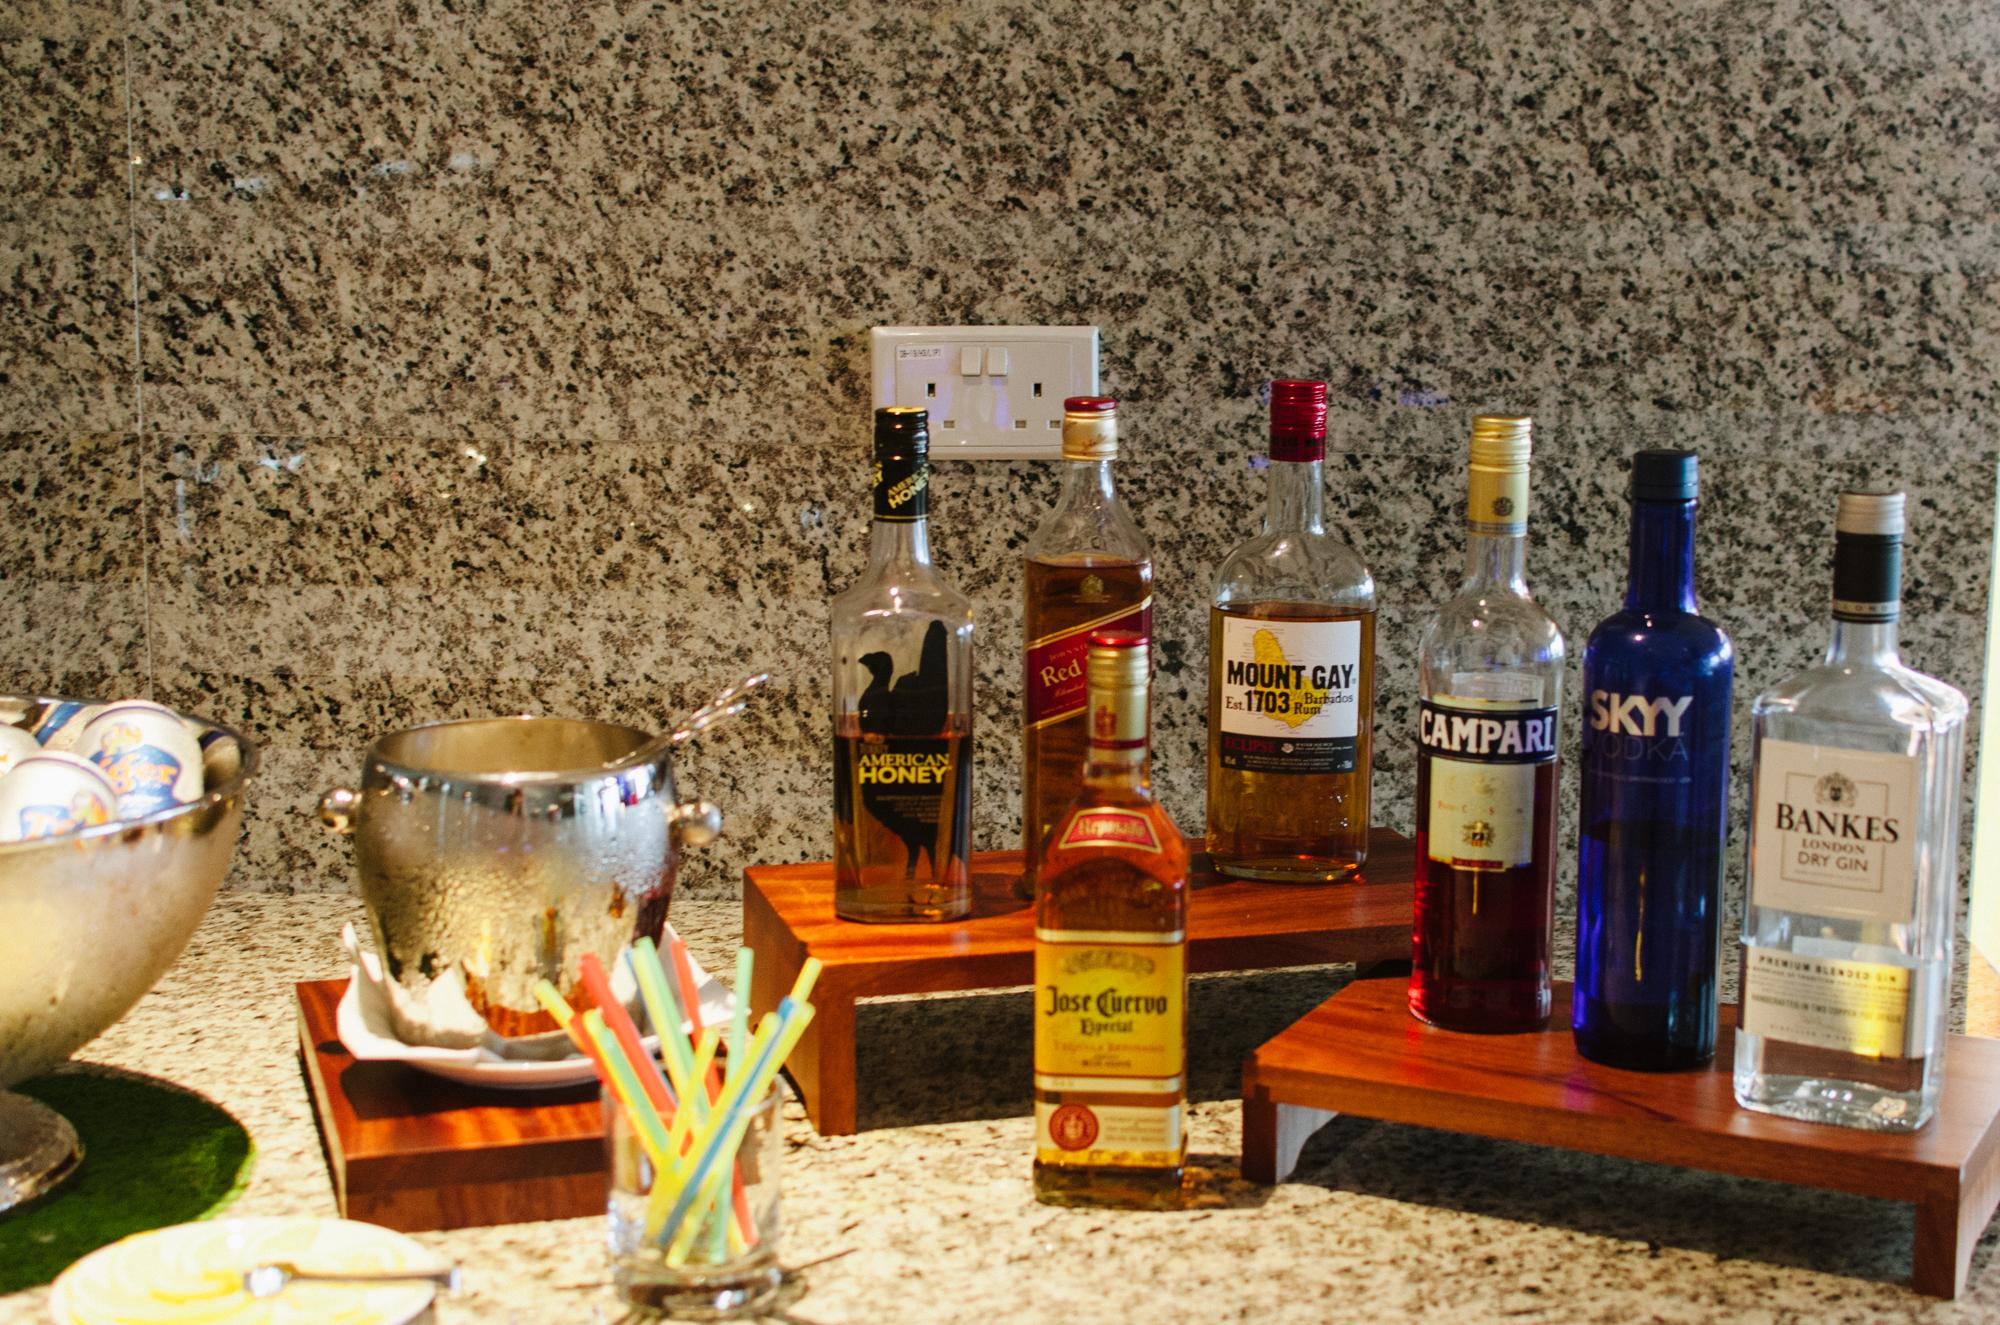 Hotel Jen Orchardgateway Executive Club Lounge Drinks